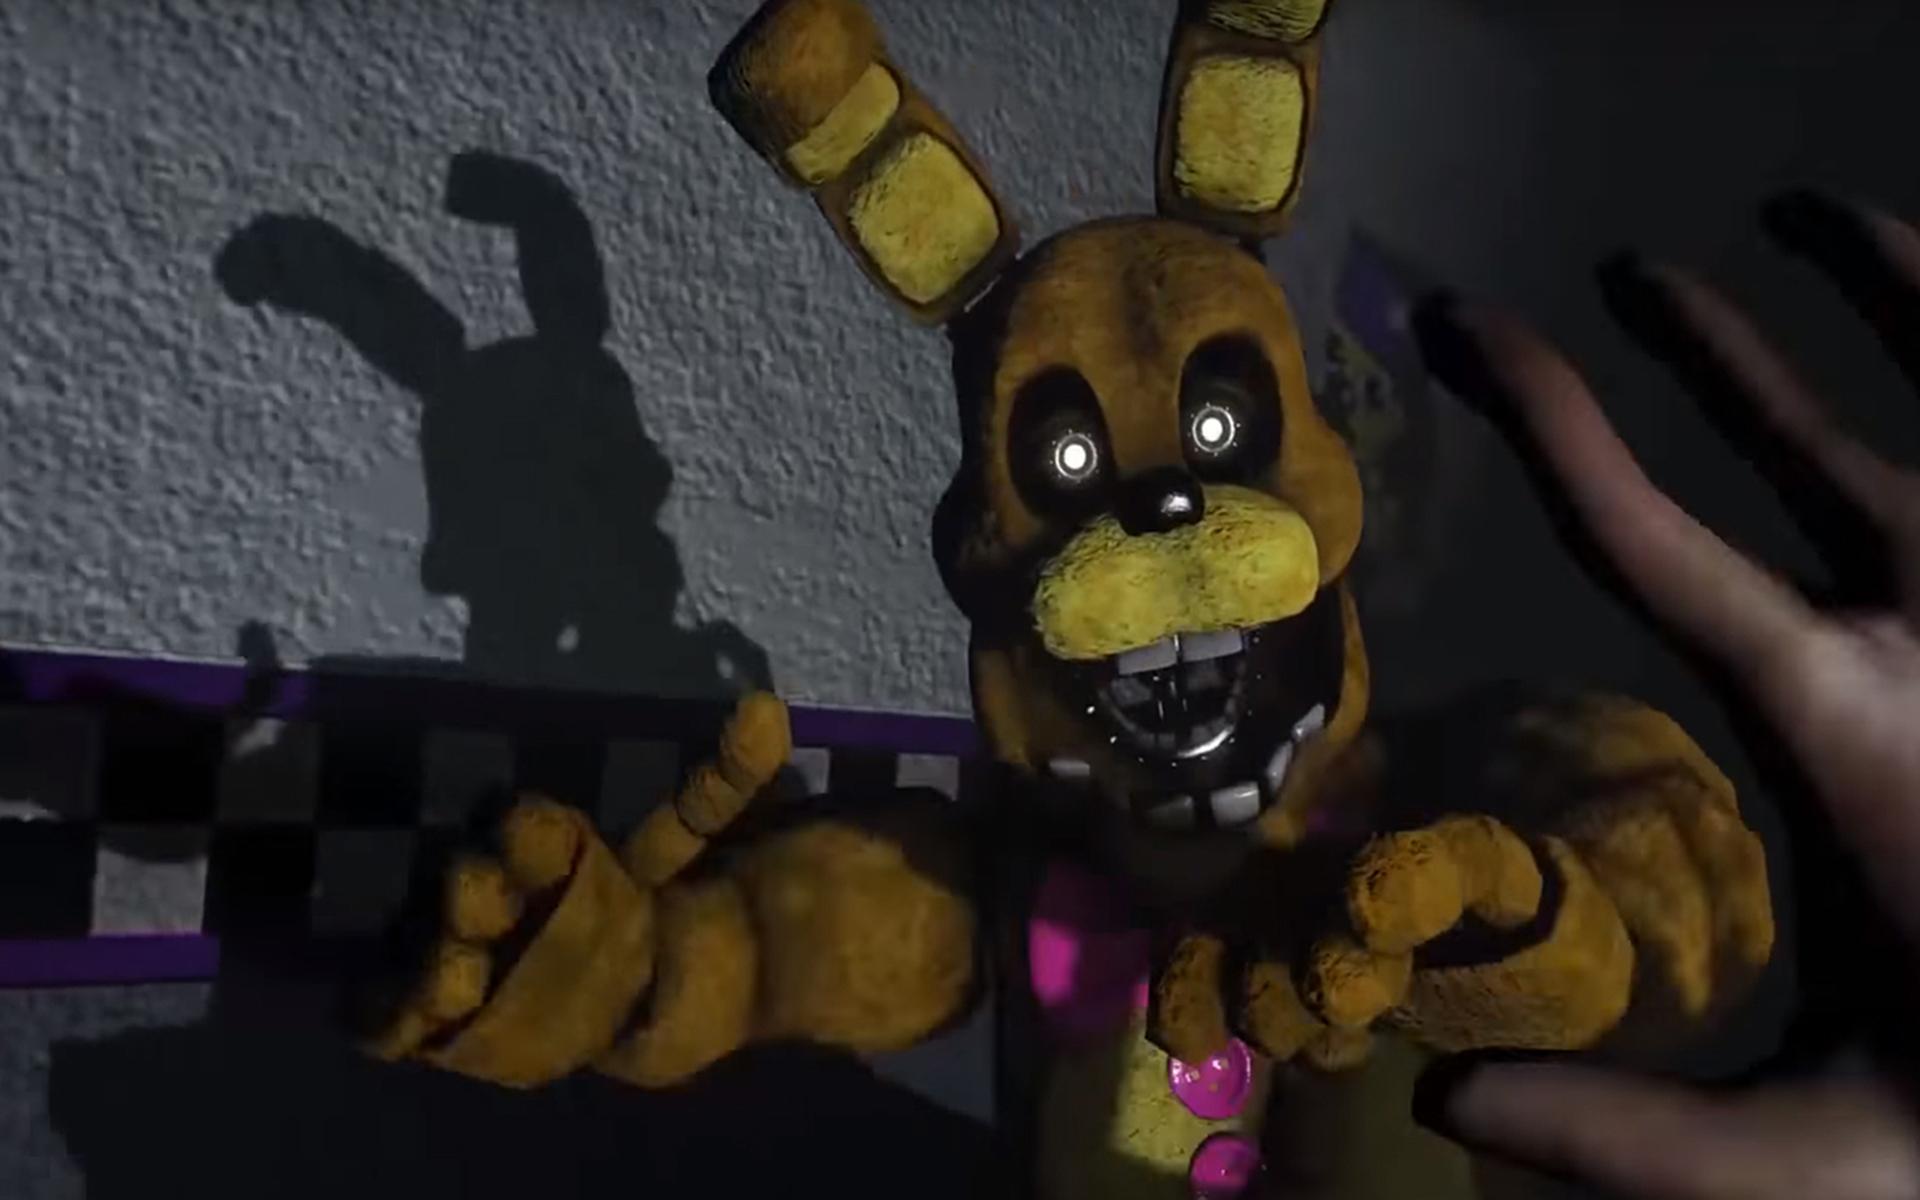 Scary Stories Freddy Demo Roblox - Freddy Fazbear 3 Six Nights Story Christmas 2017 For